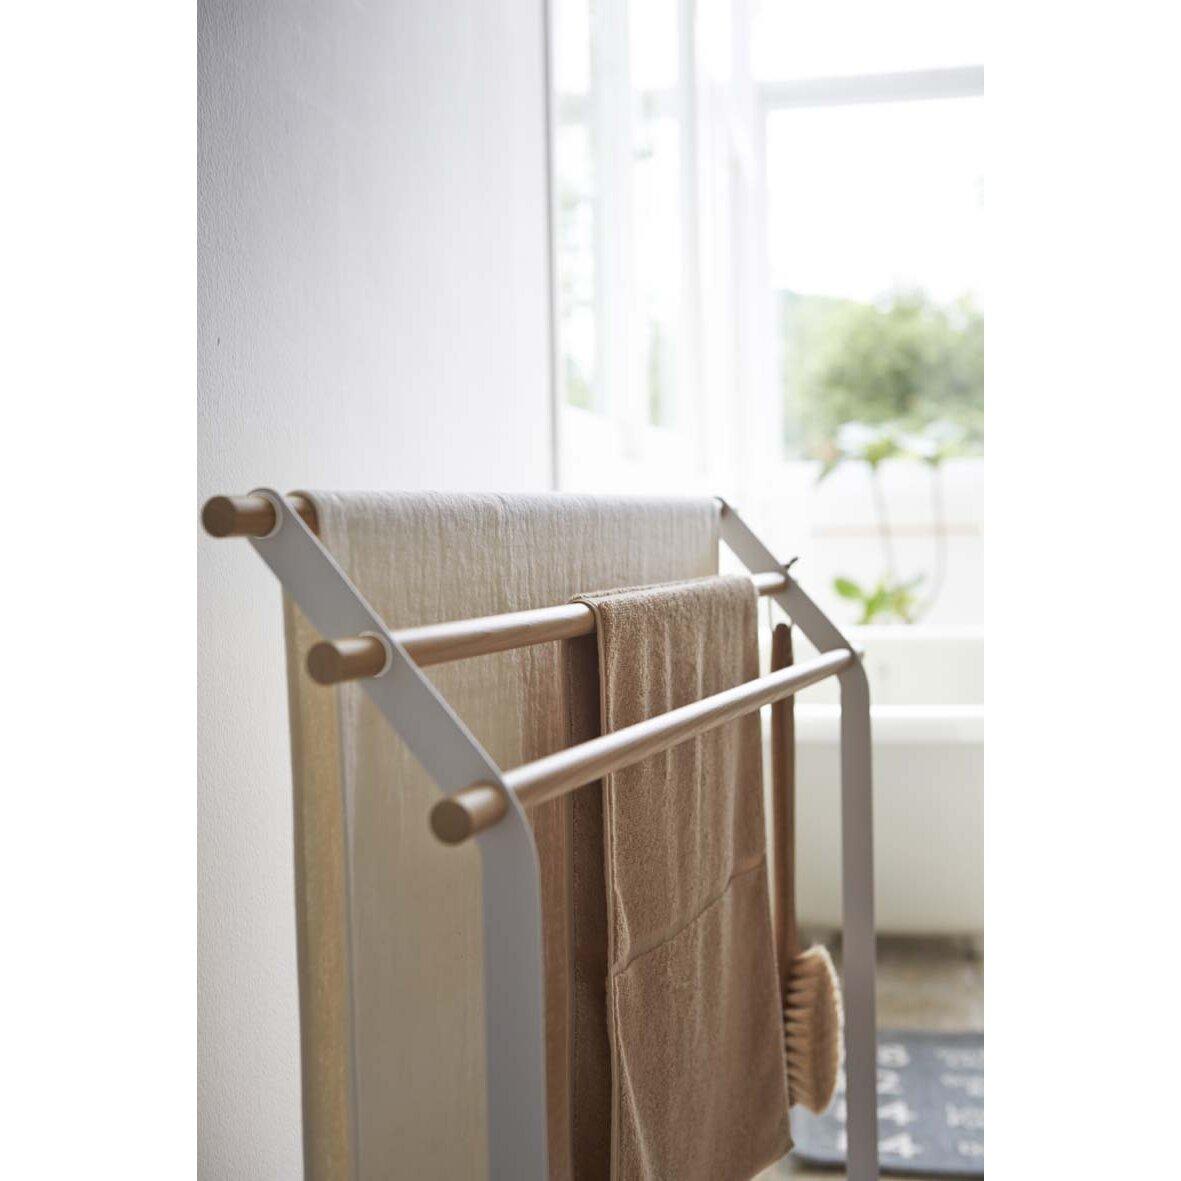 yamazaki usa tosca freestanding bath towel stand wayfair ca